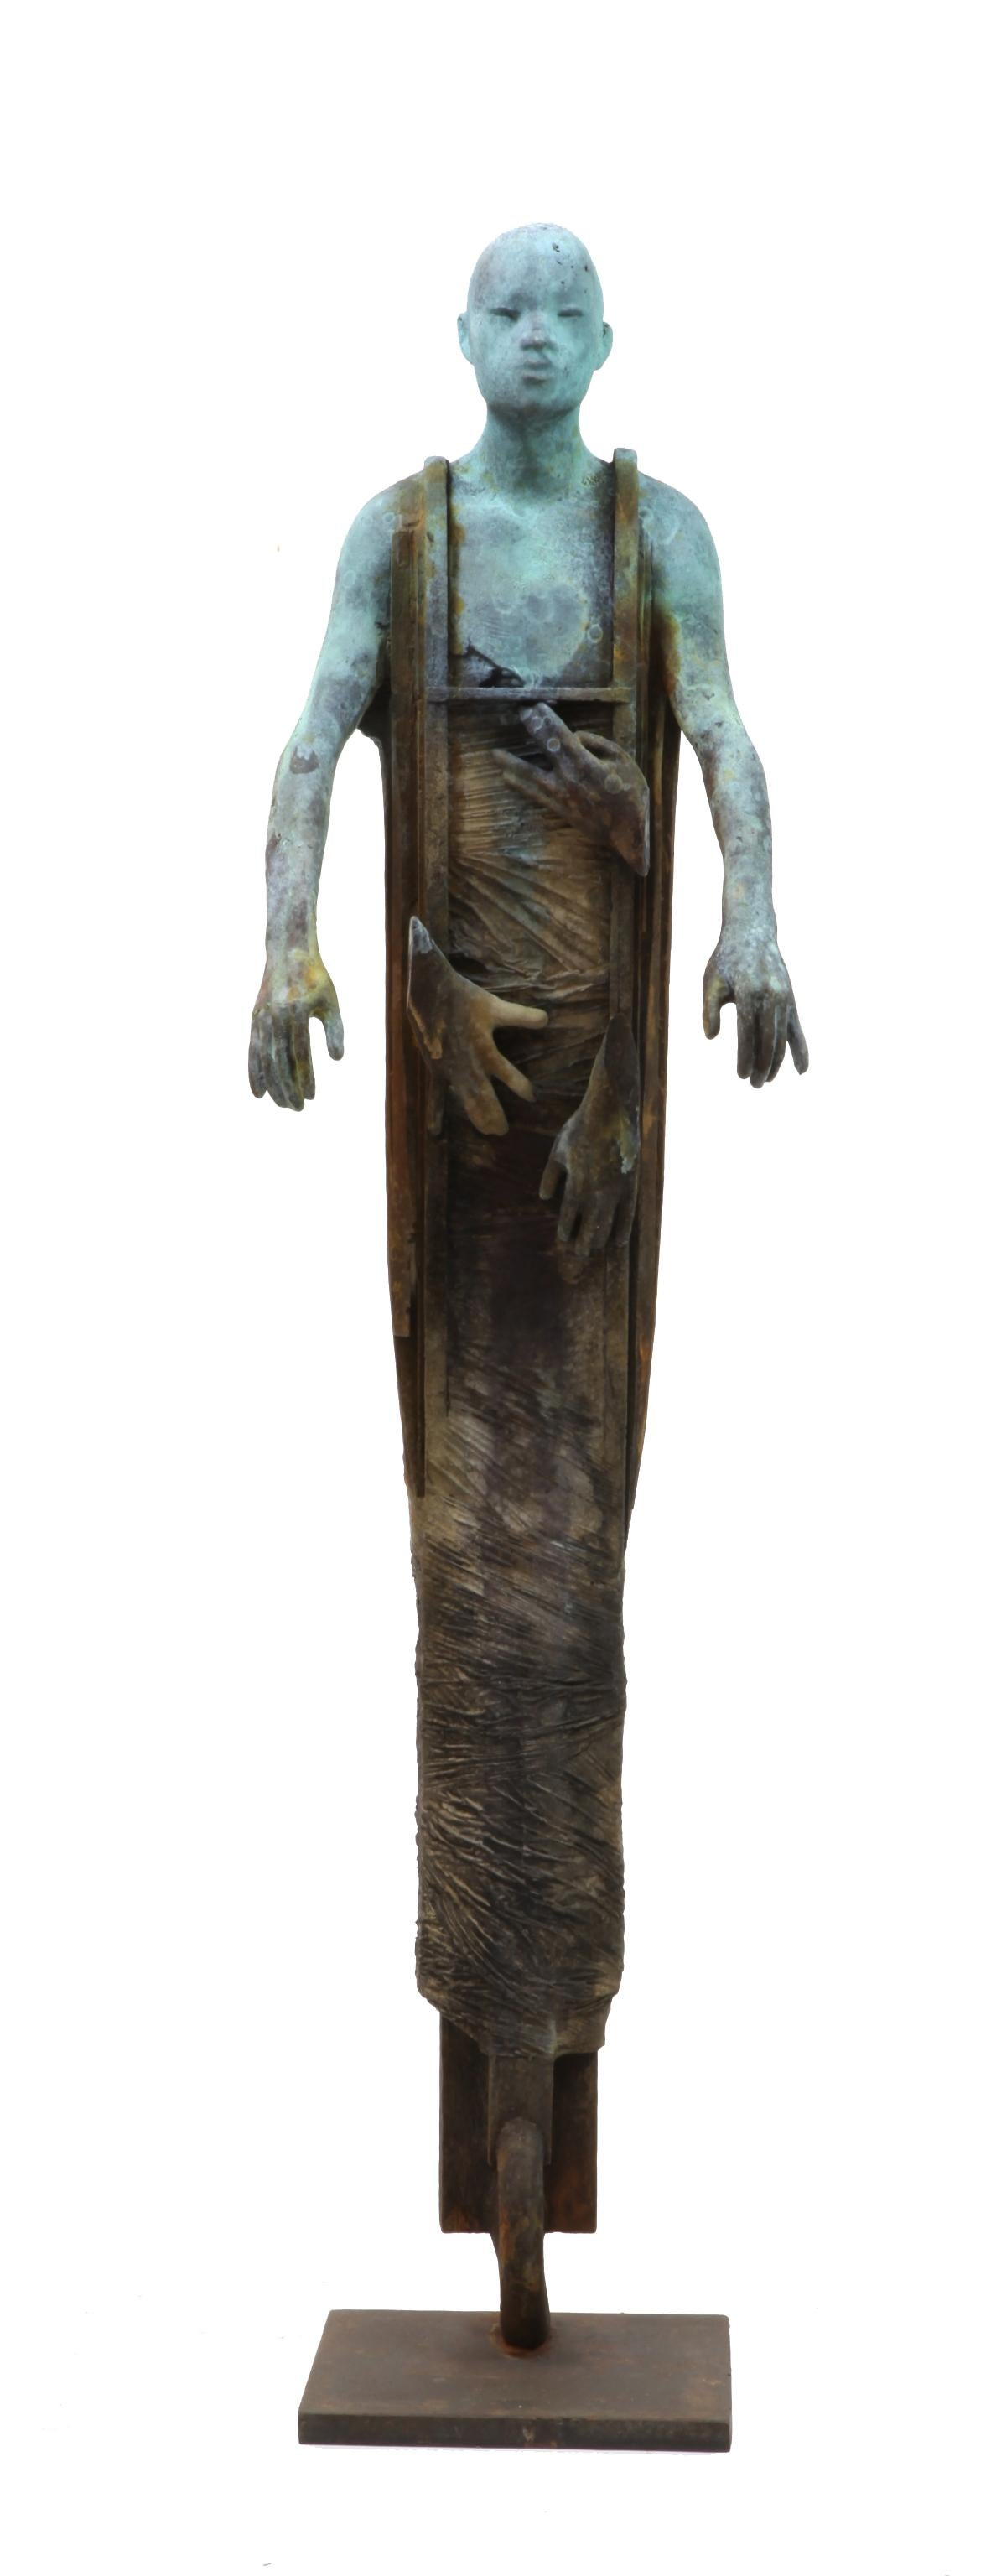 Centauro - Cast Bronze Figure Geometric and Organic Elements by Jesús Curiá